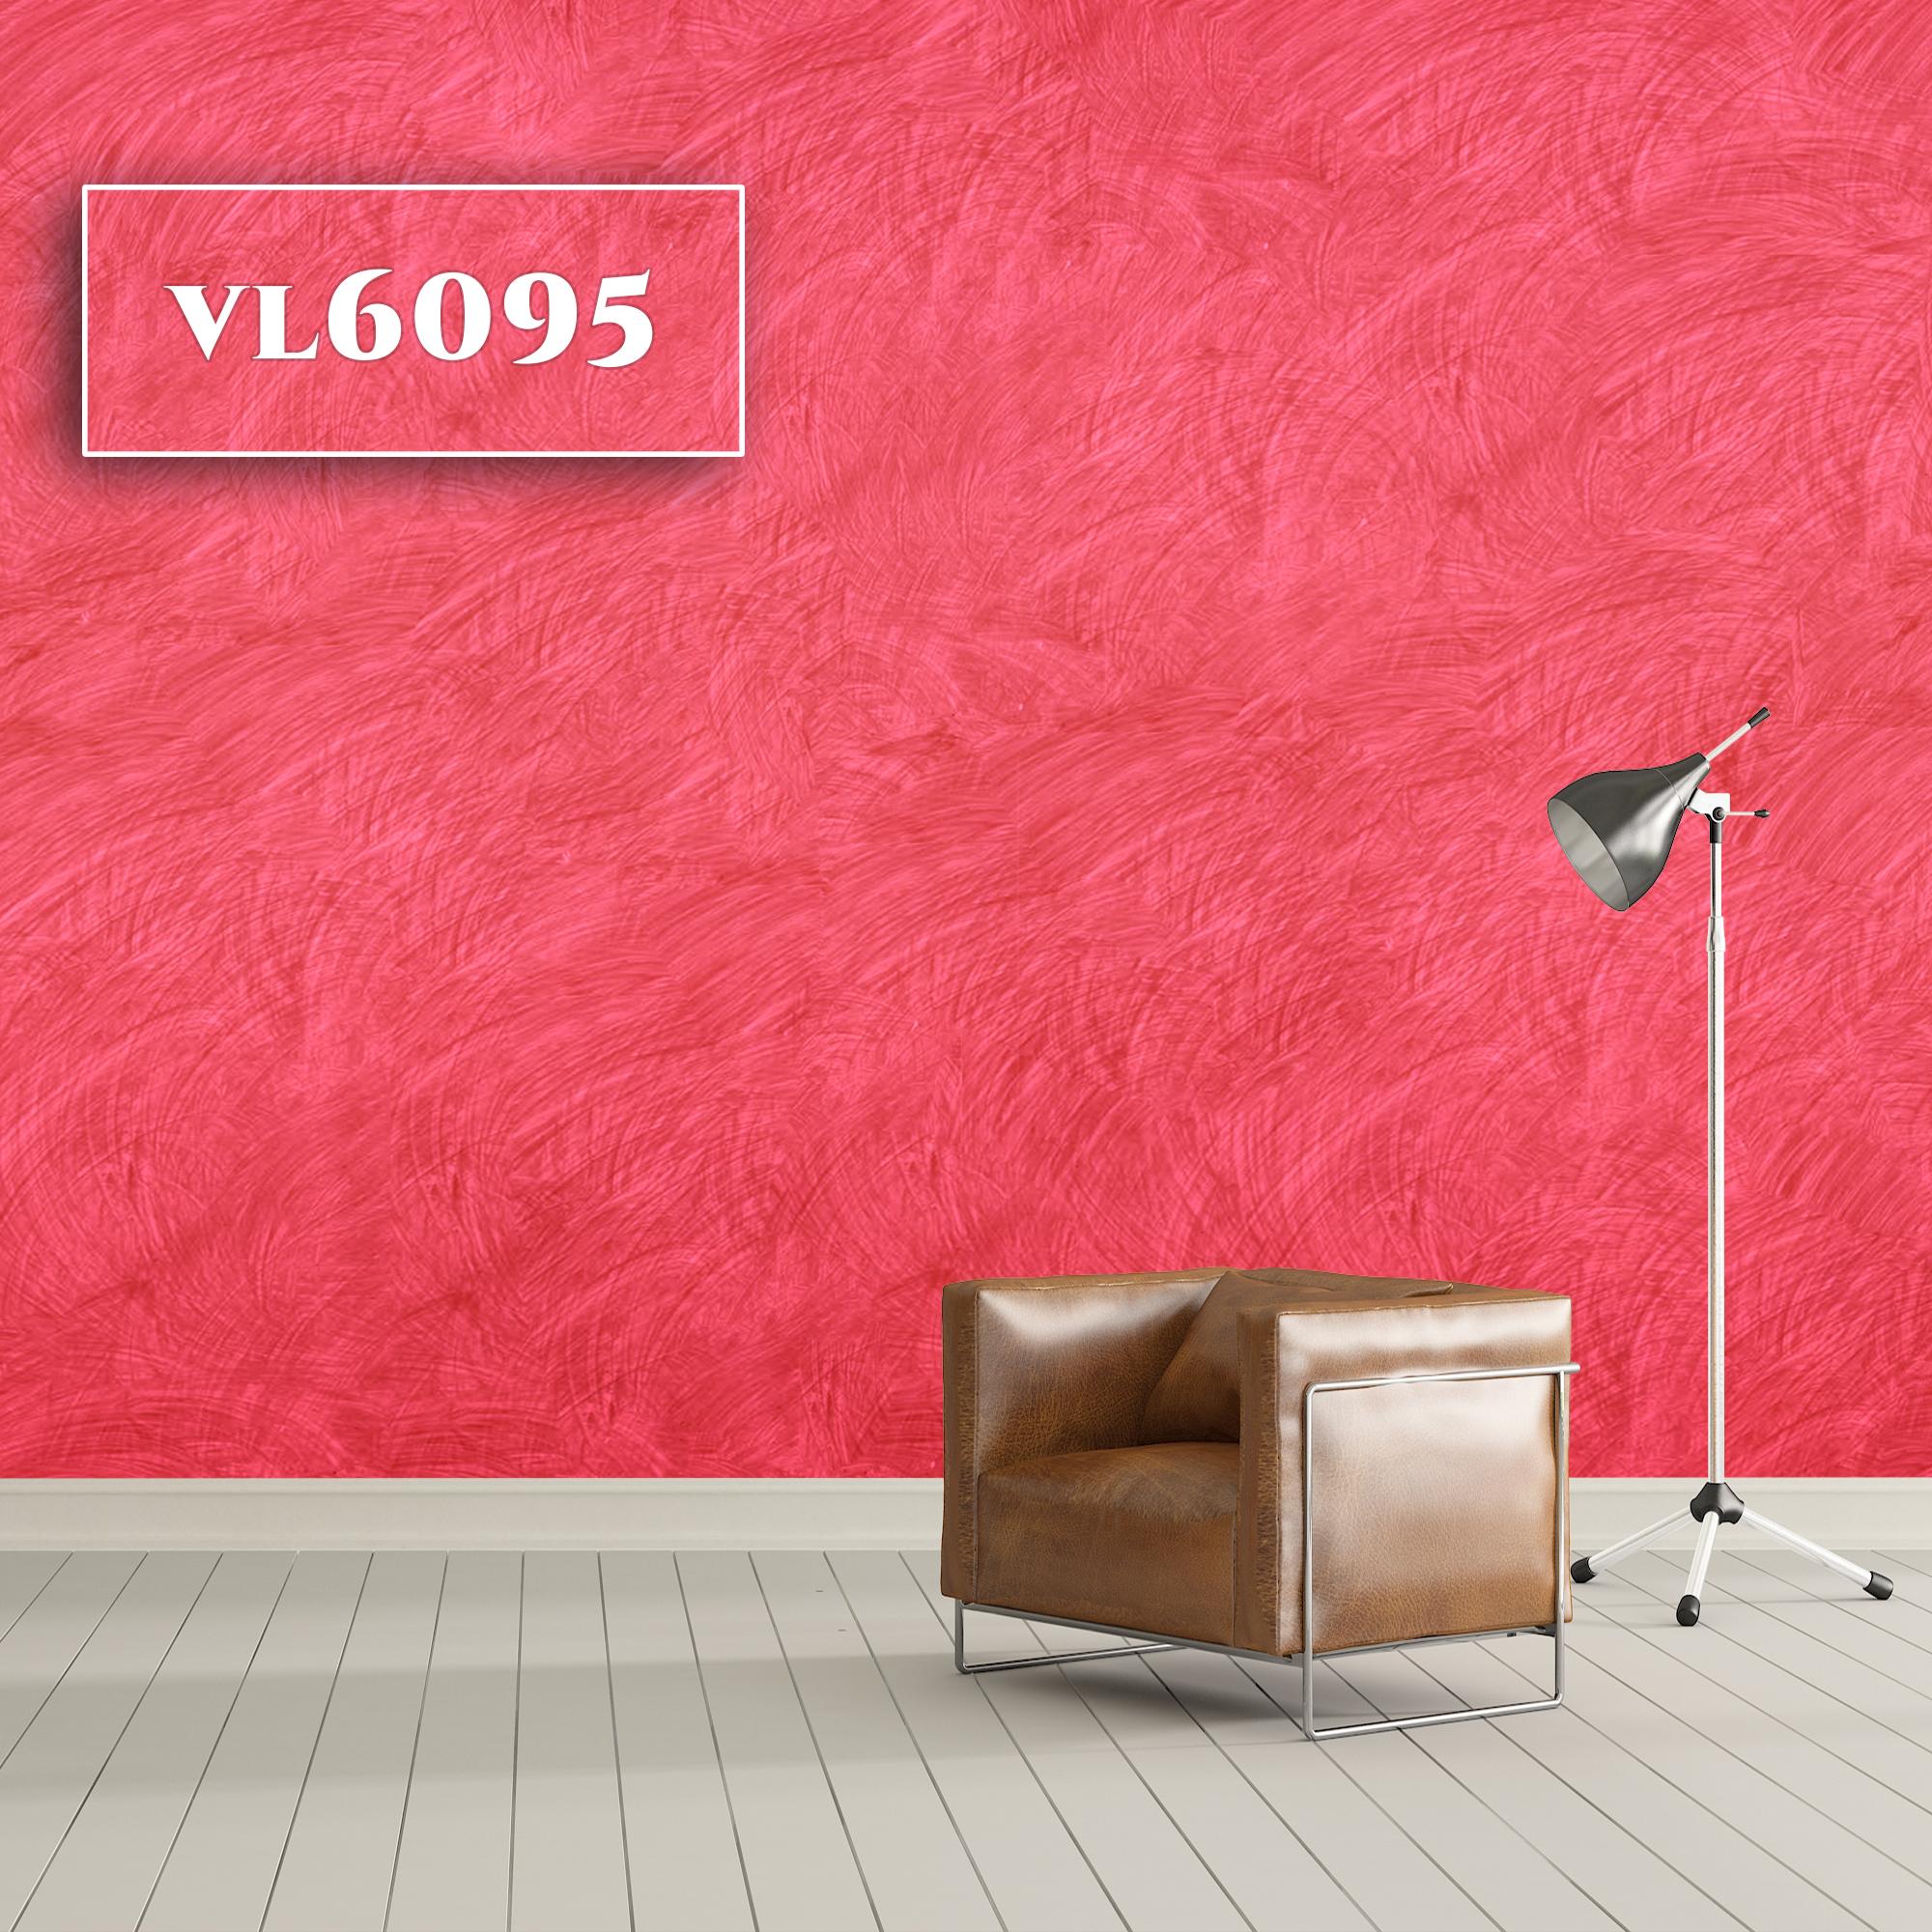 VL6095